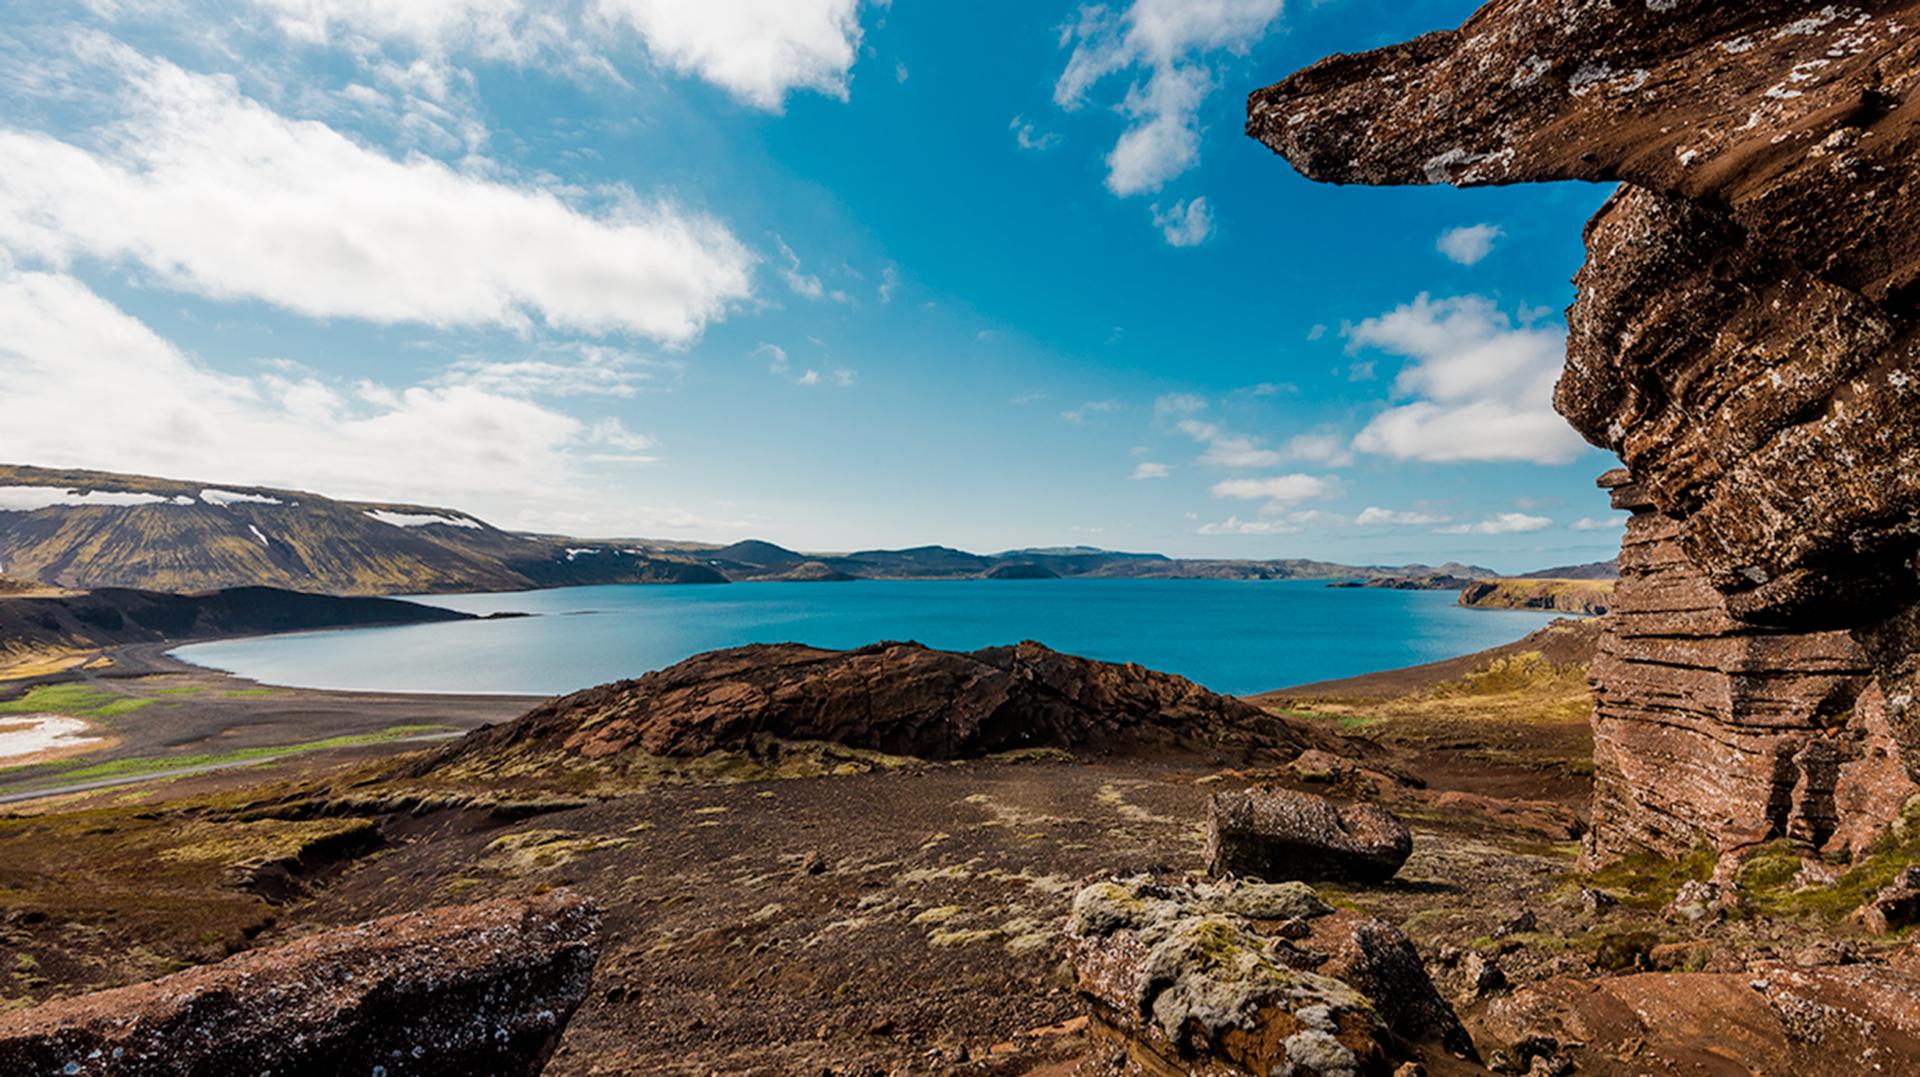 Islàndia, paradís natural